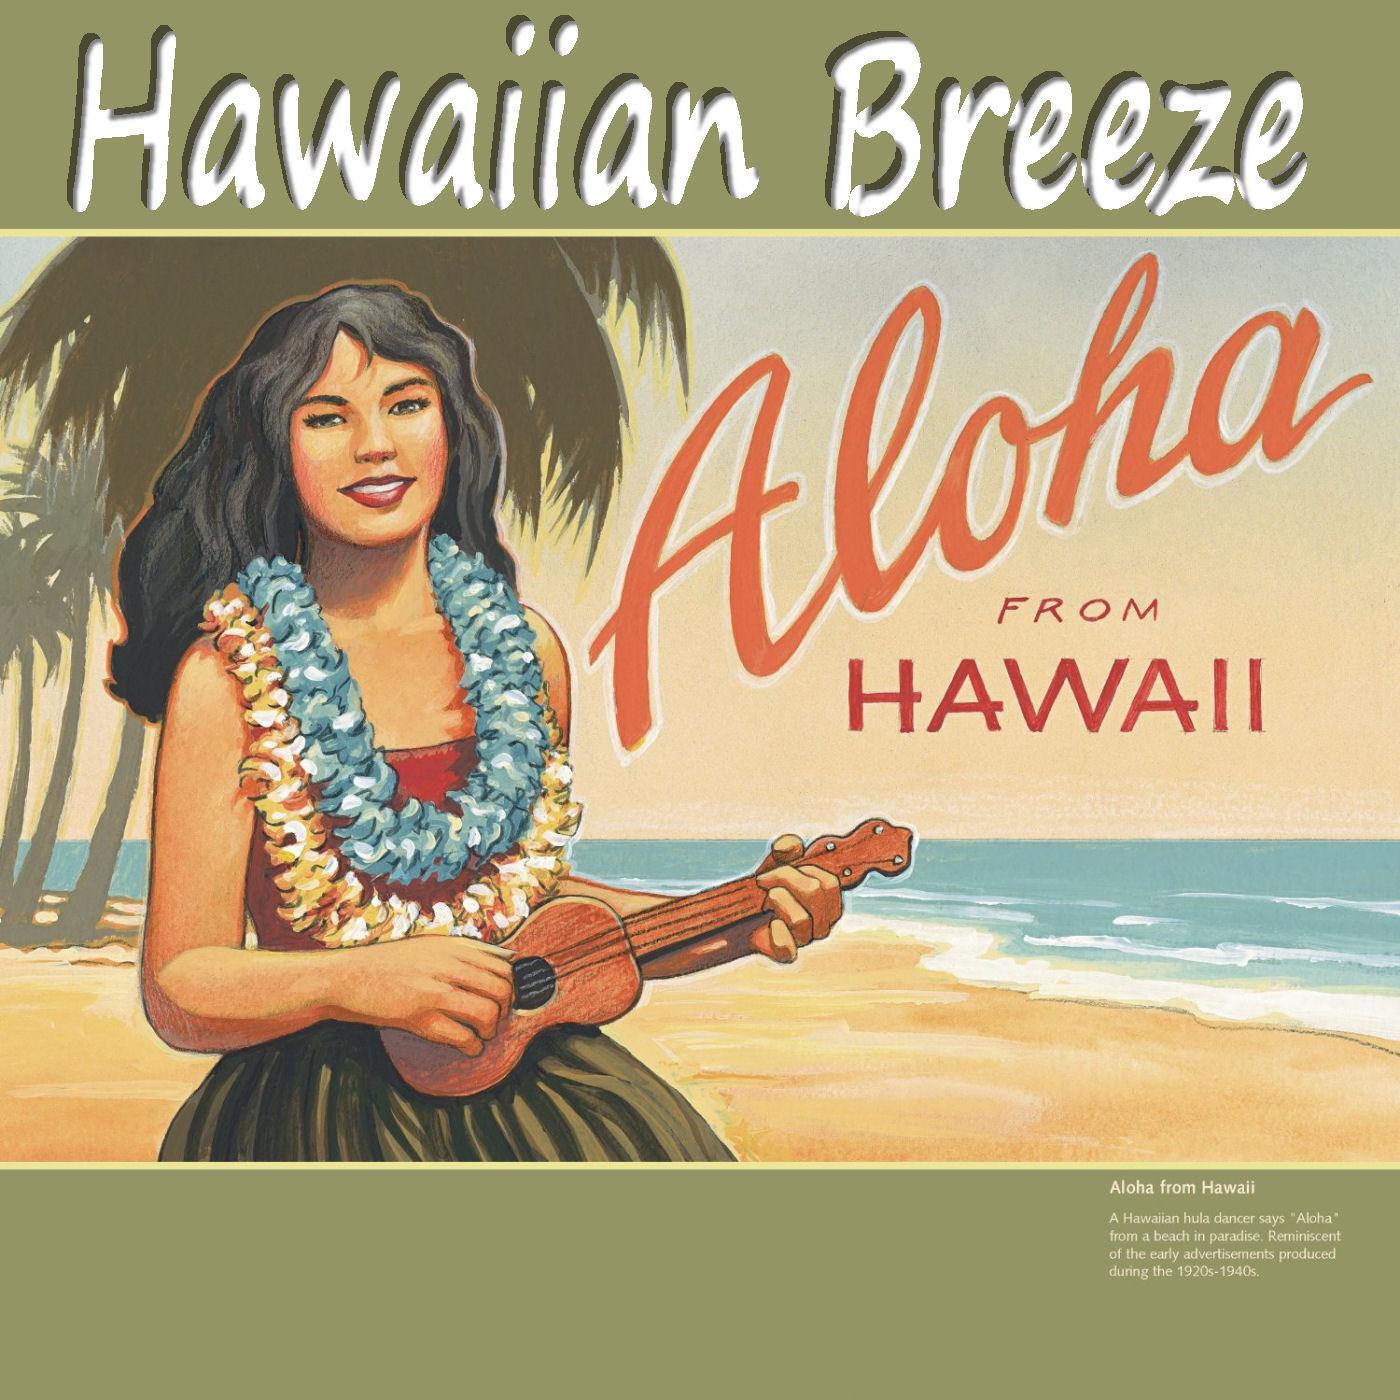 Caption: Hawaiian Breeze, Credit: Larry W Jones